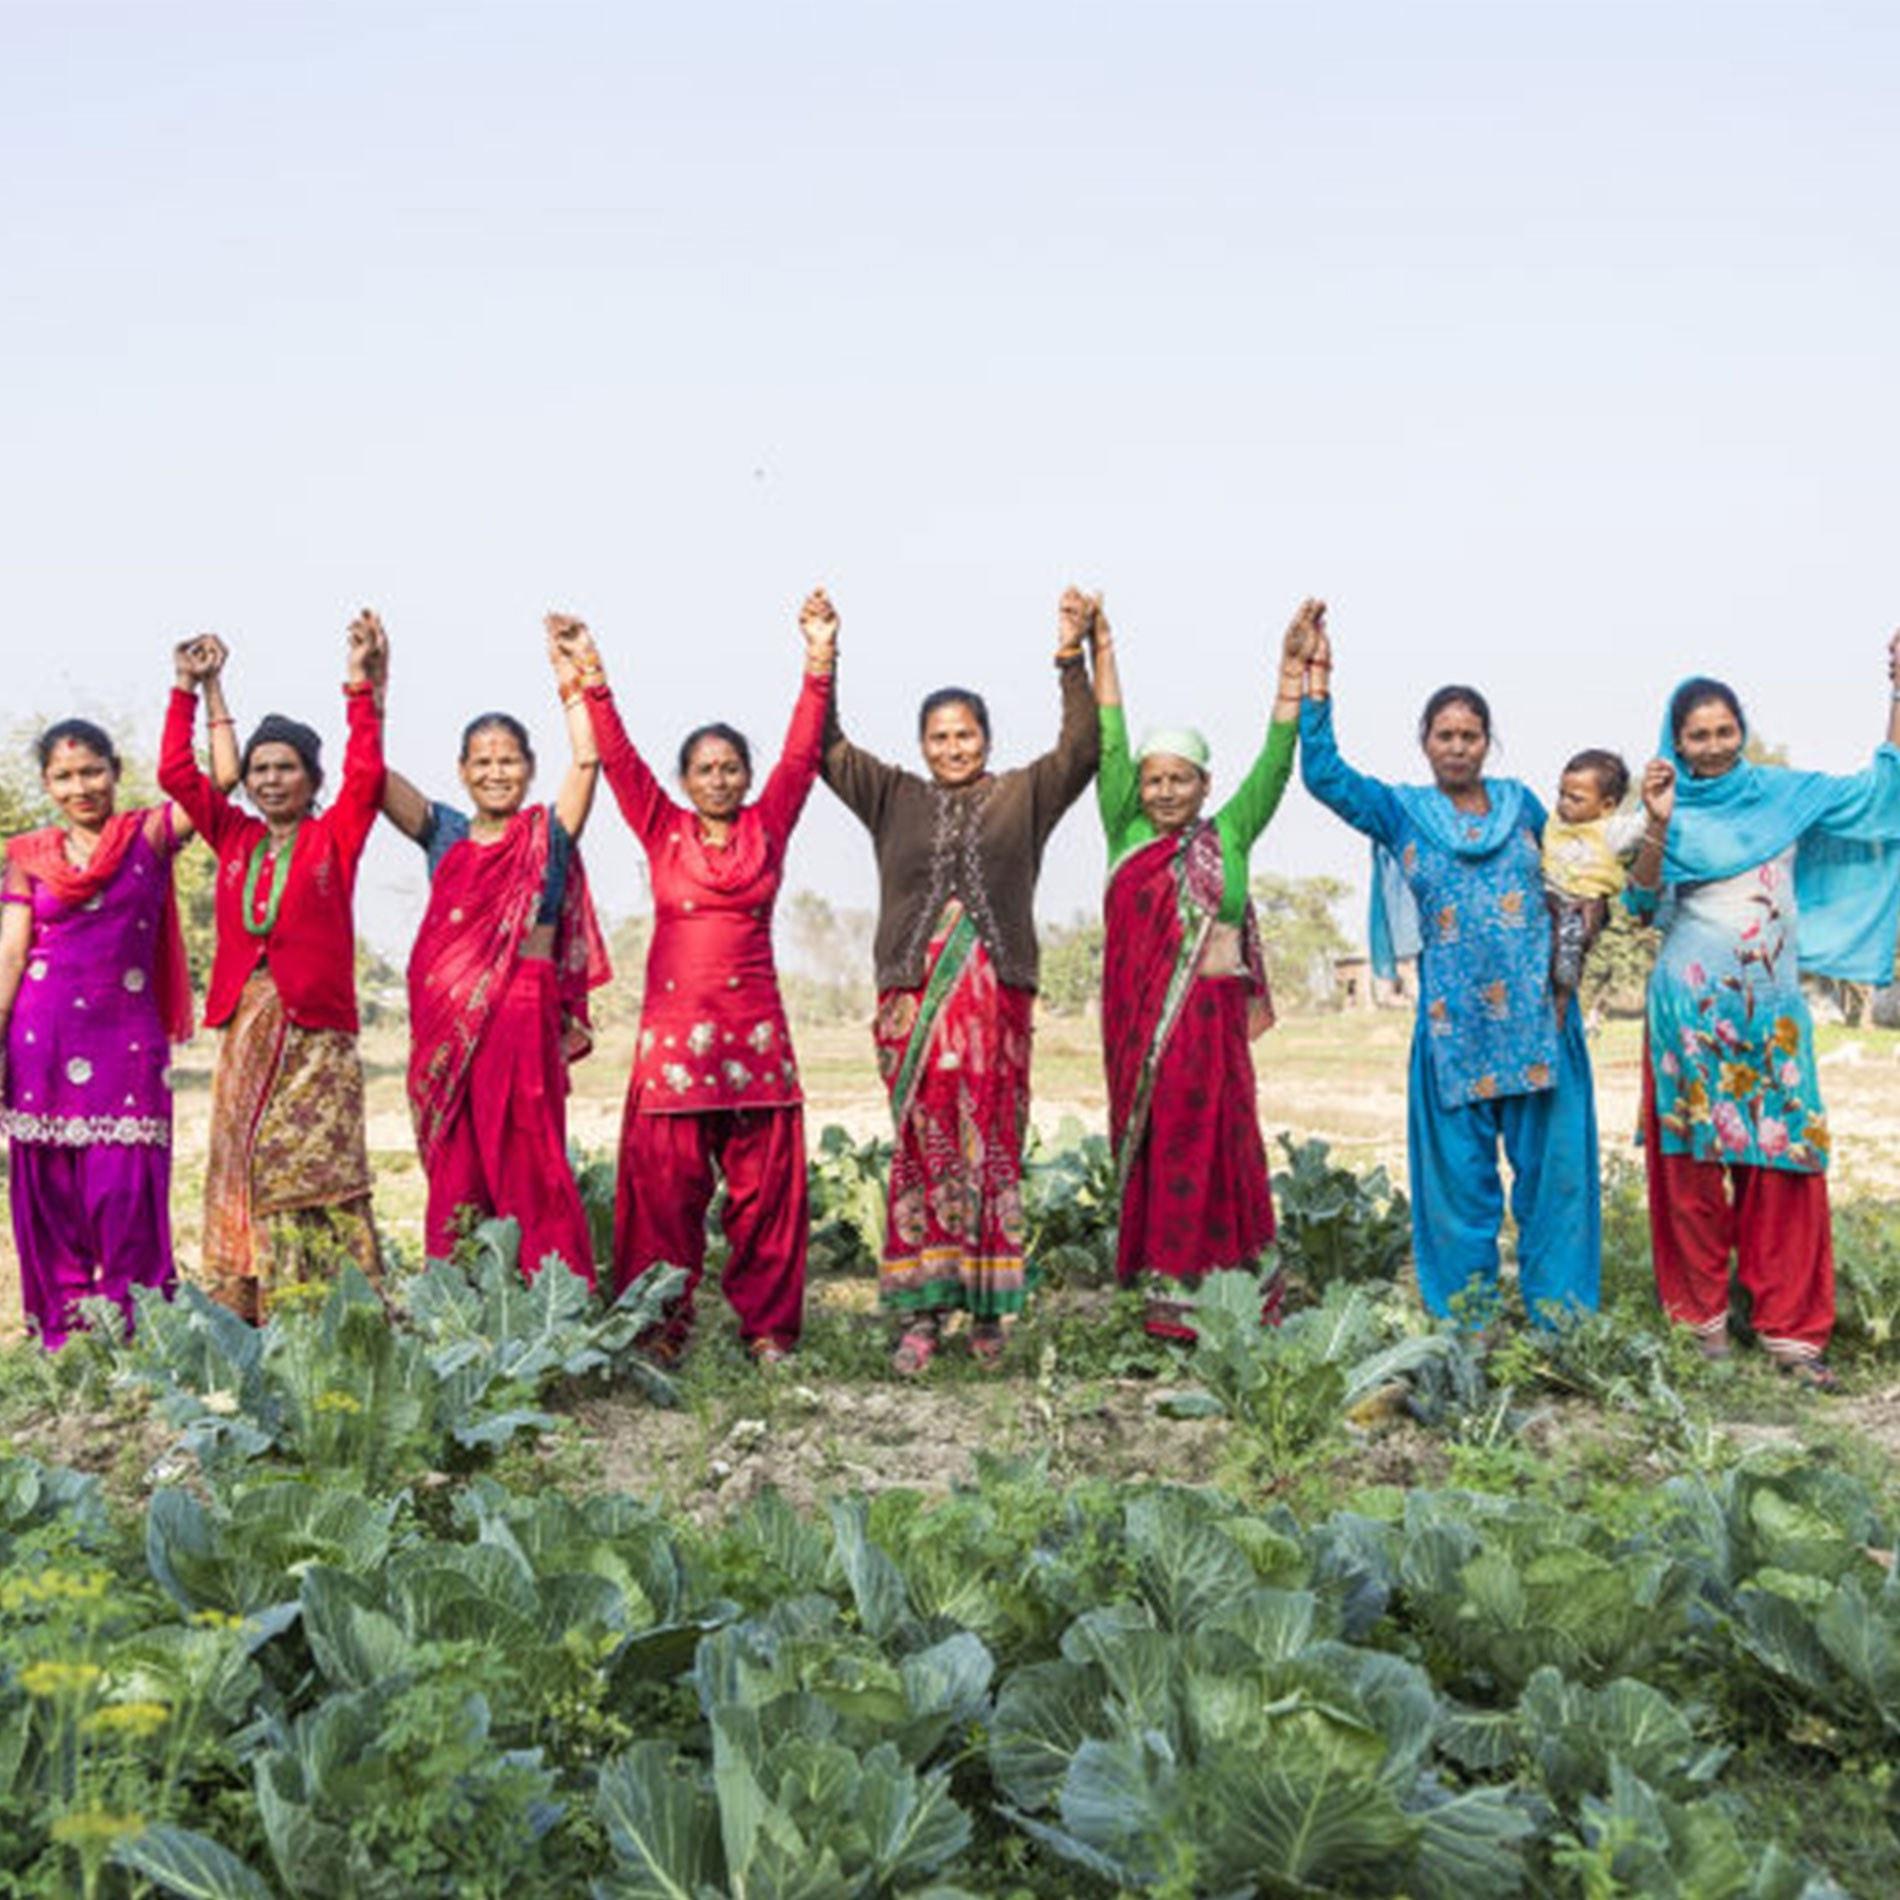 Womankind partnership